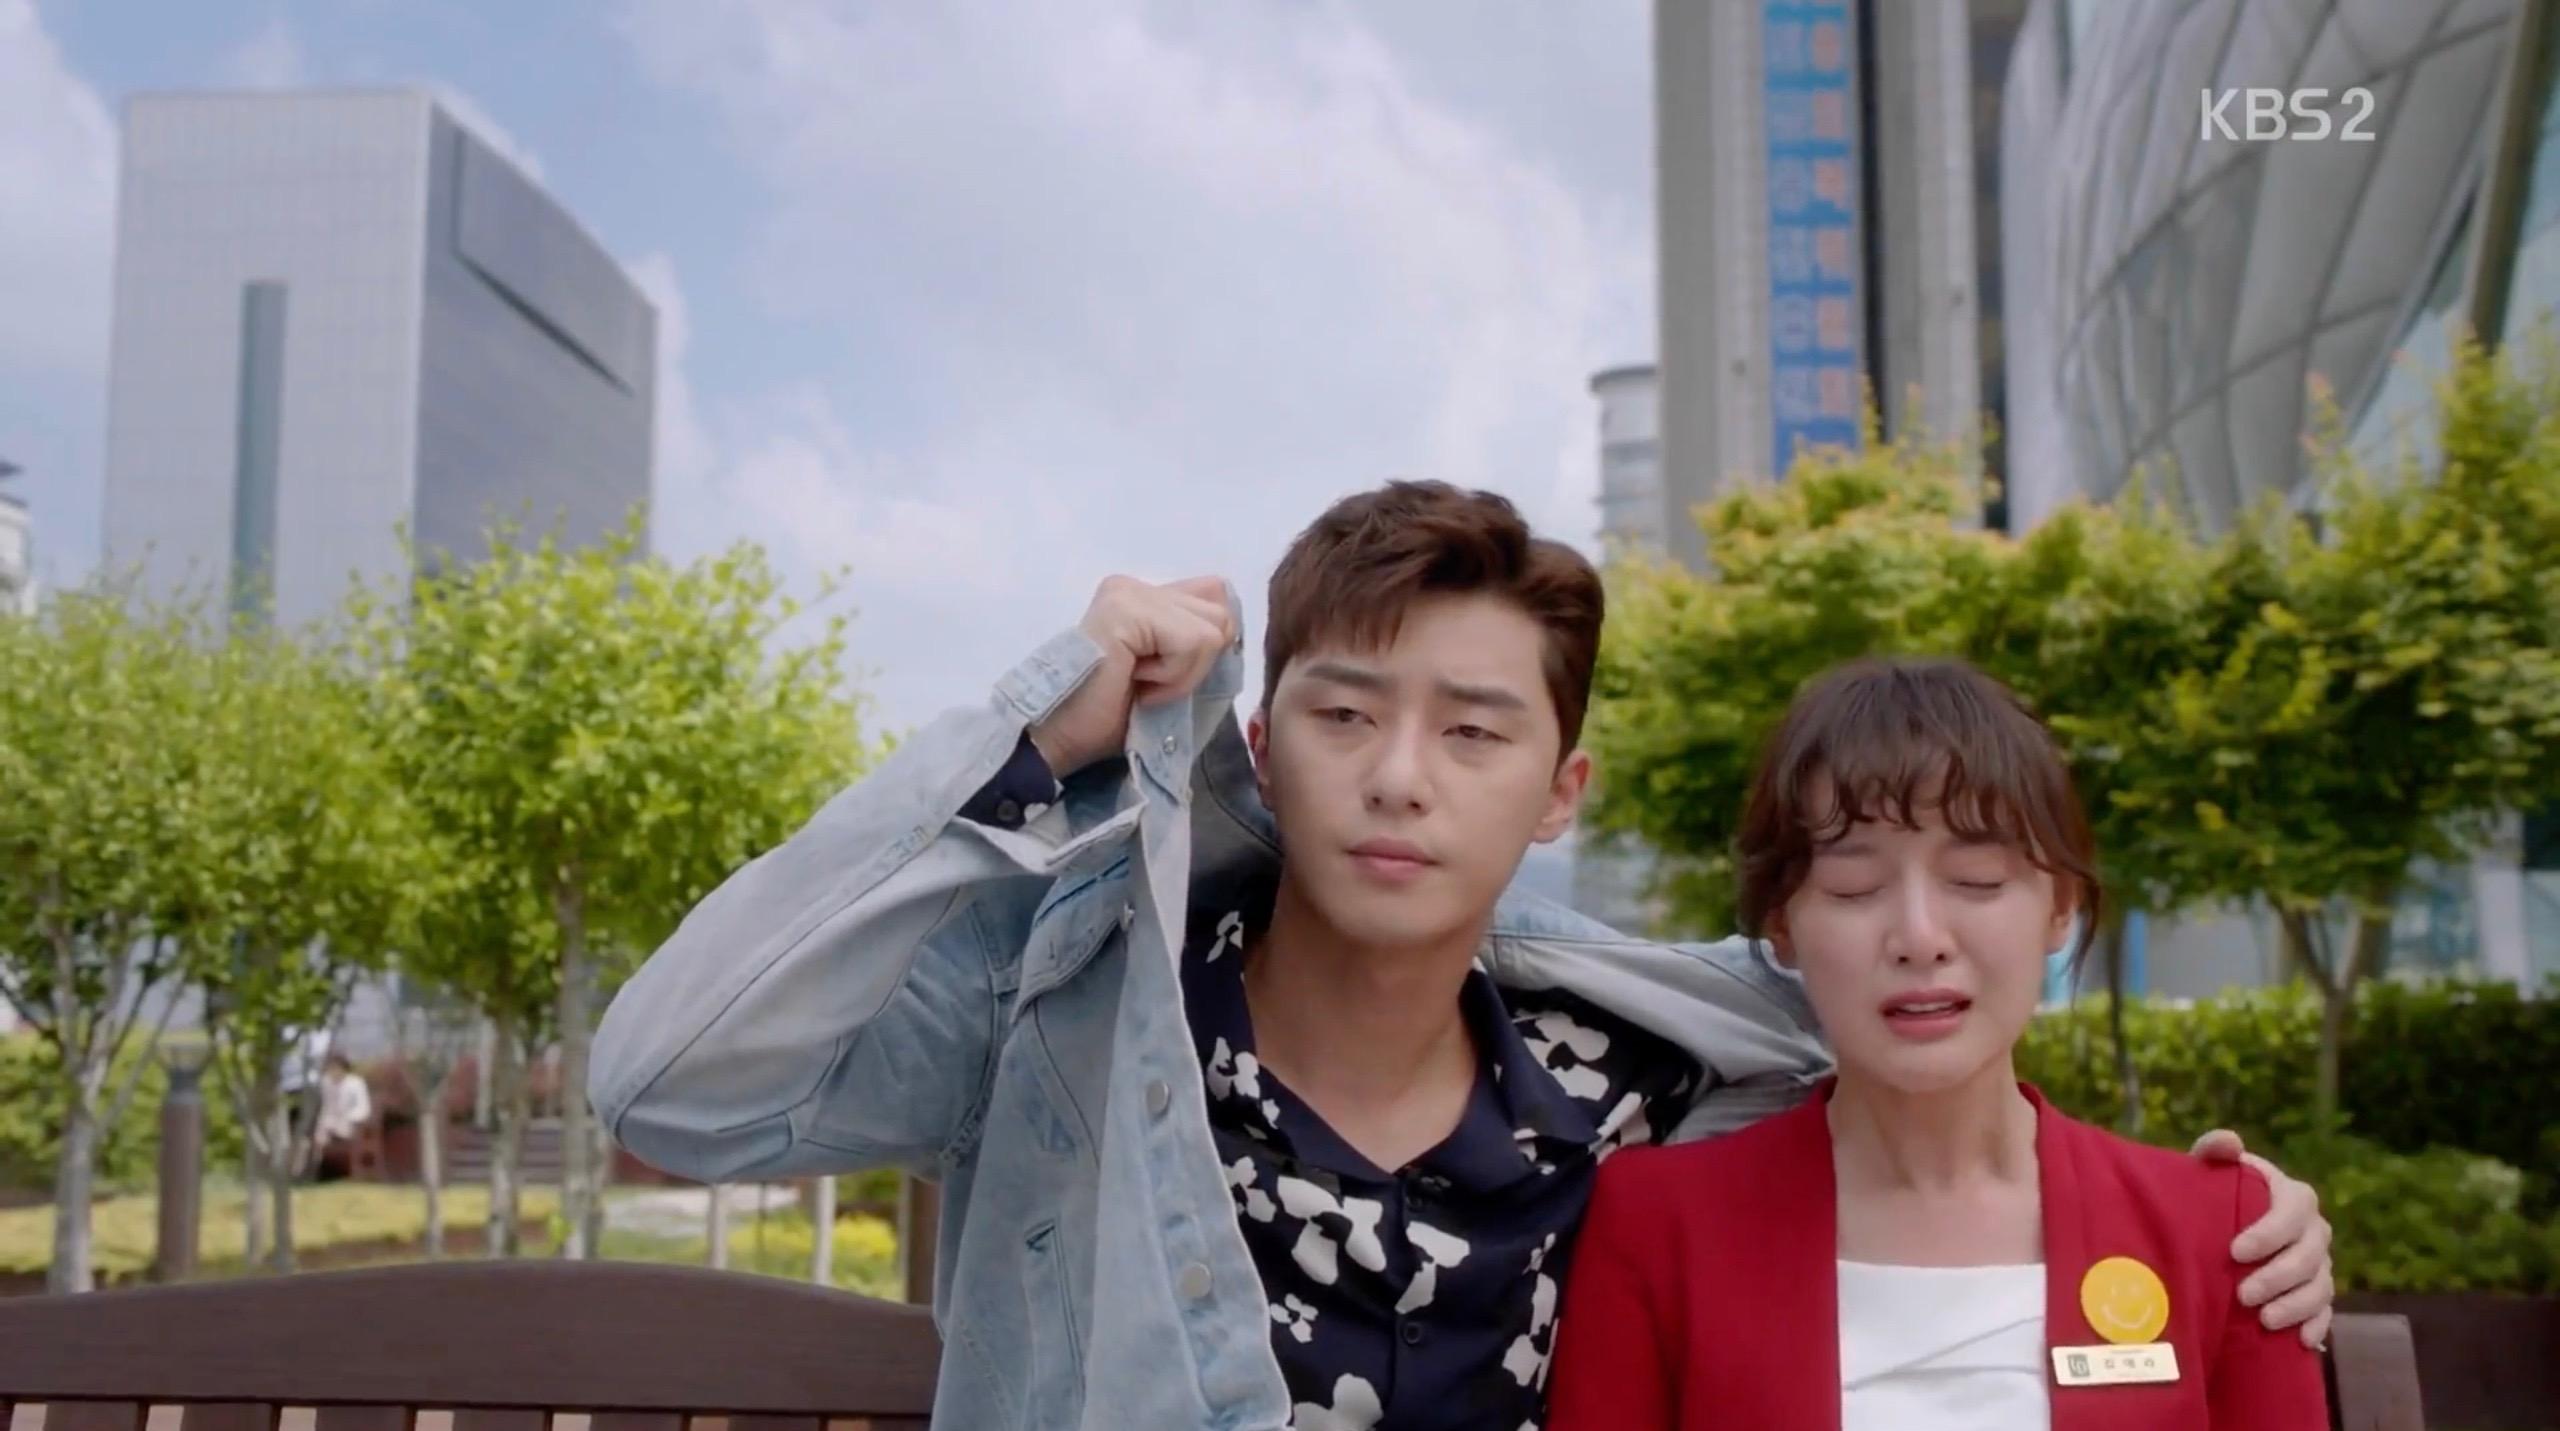 fight-for-my-way-2017-filming-location-episode-3-seoul-metropolitan-library-koreandramaland-d.jpg